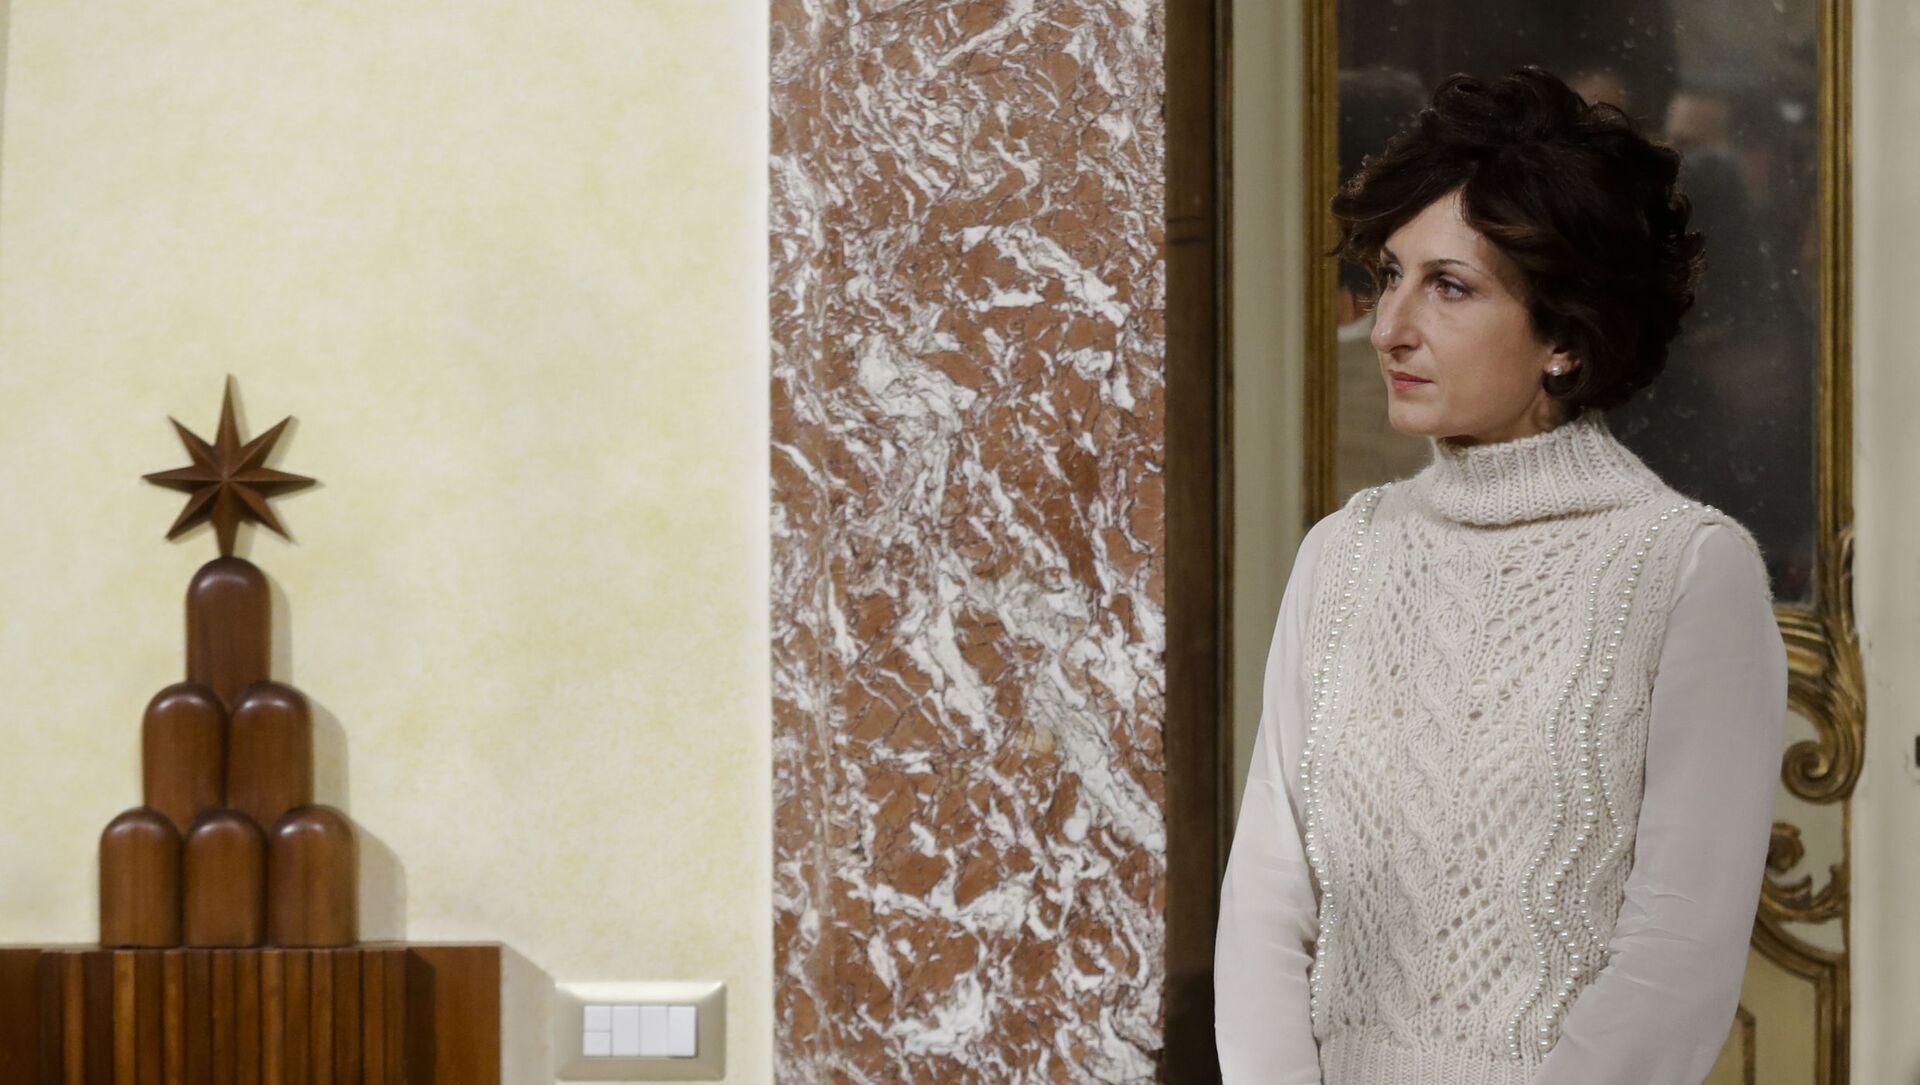 Agnese Landini, la moglie di Matteo Renzi - Sputnik Italia, 1920, 06.04.2021